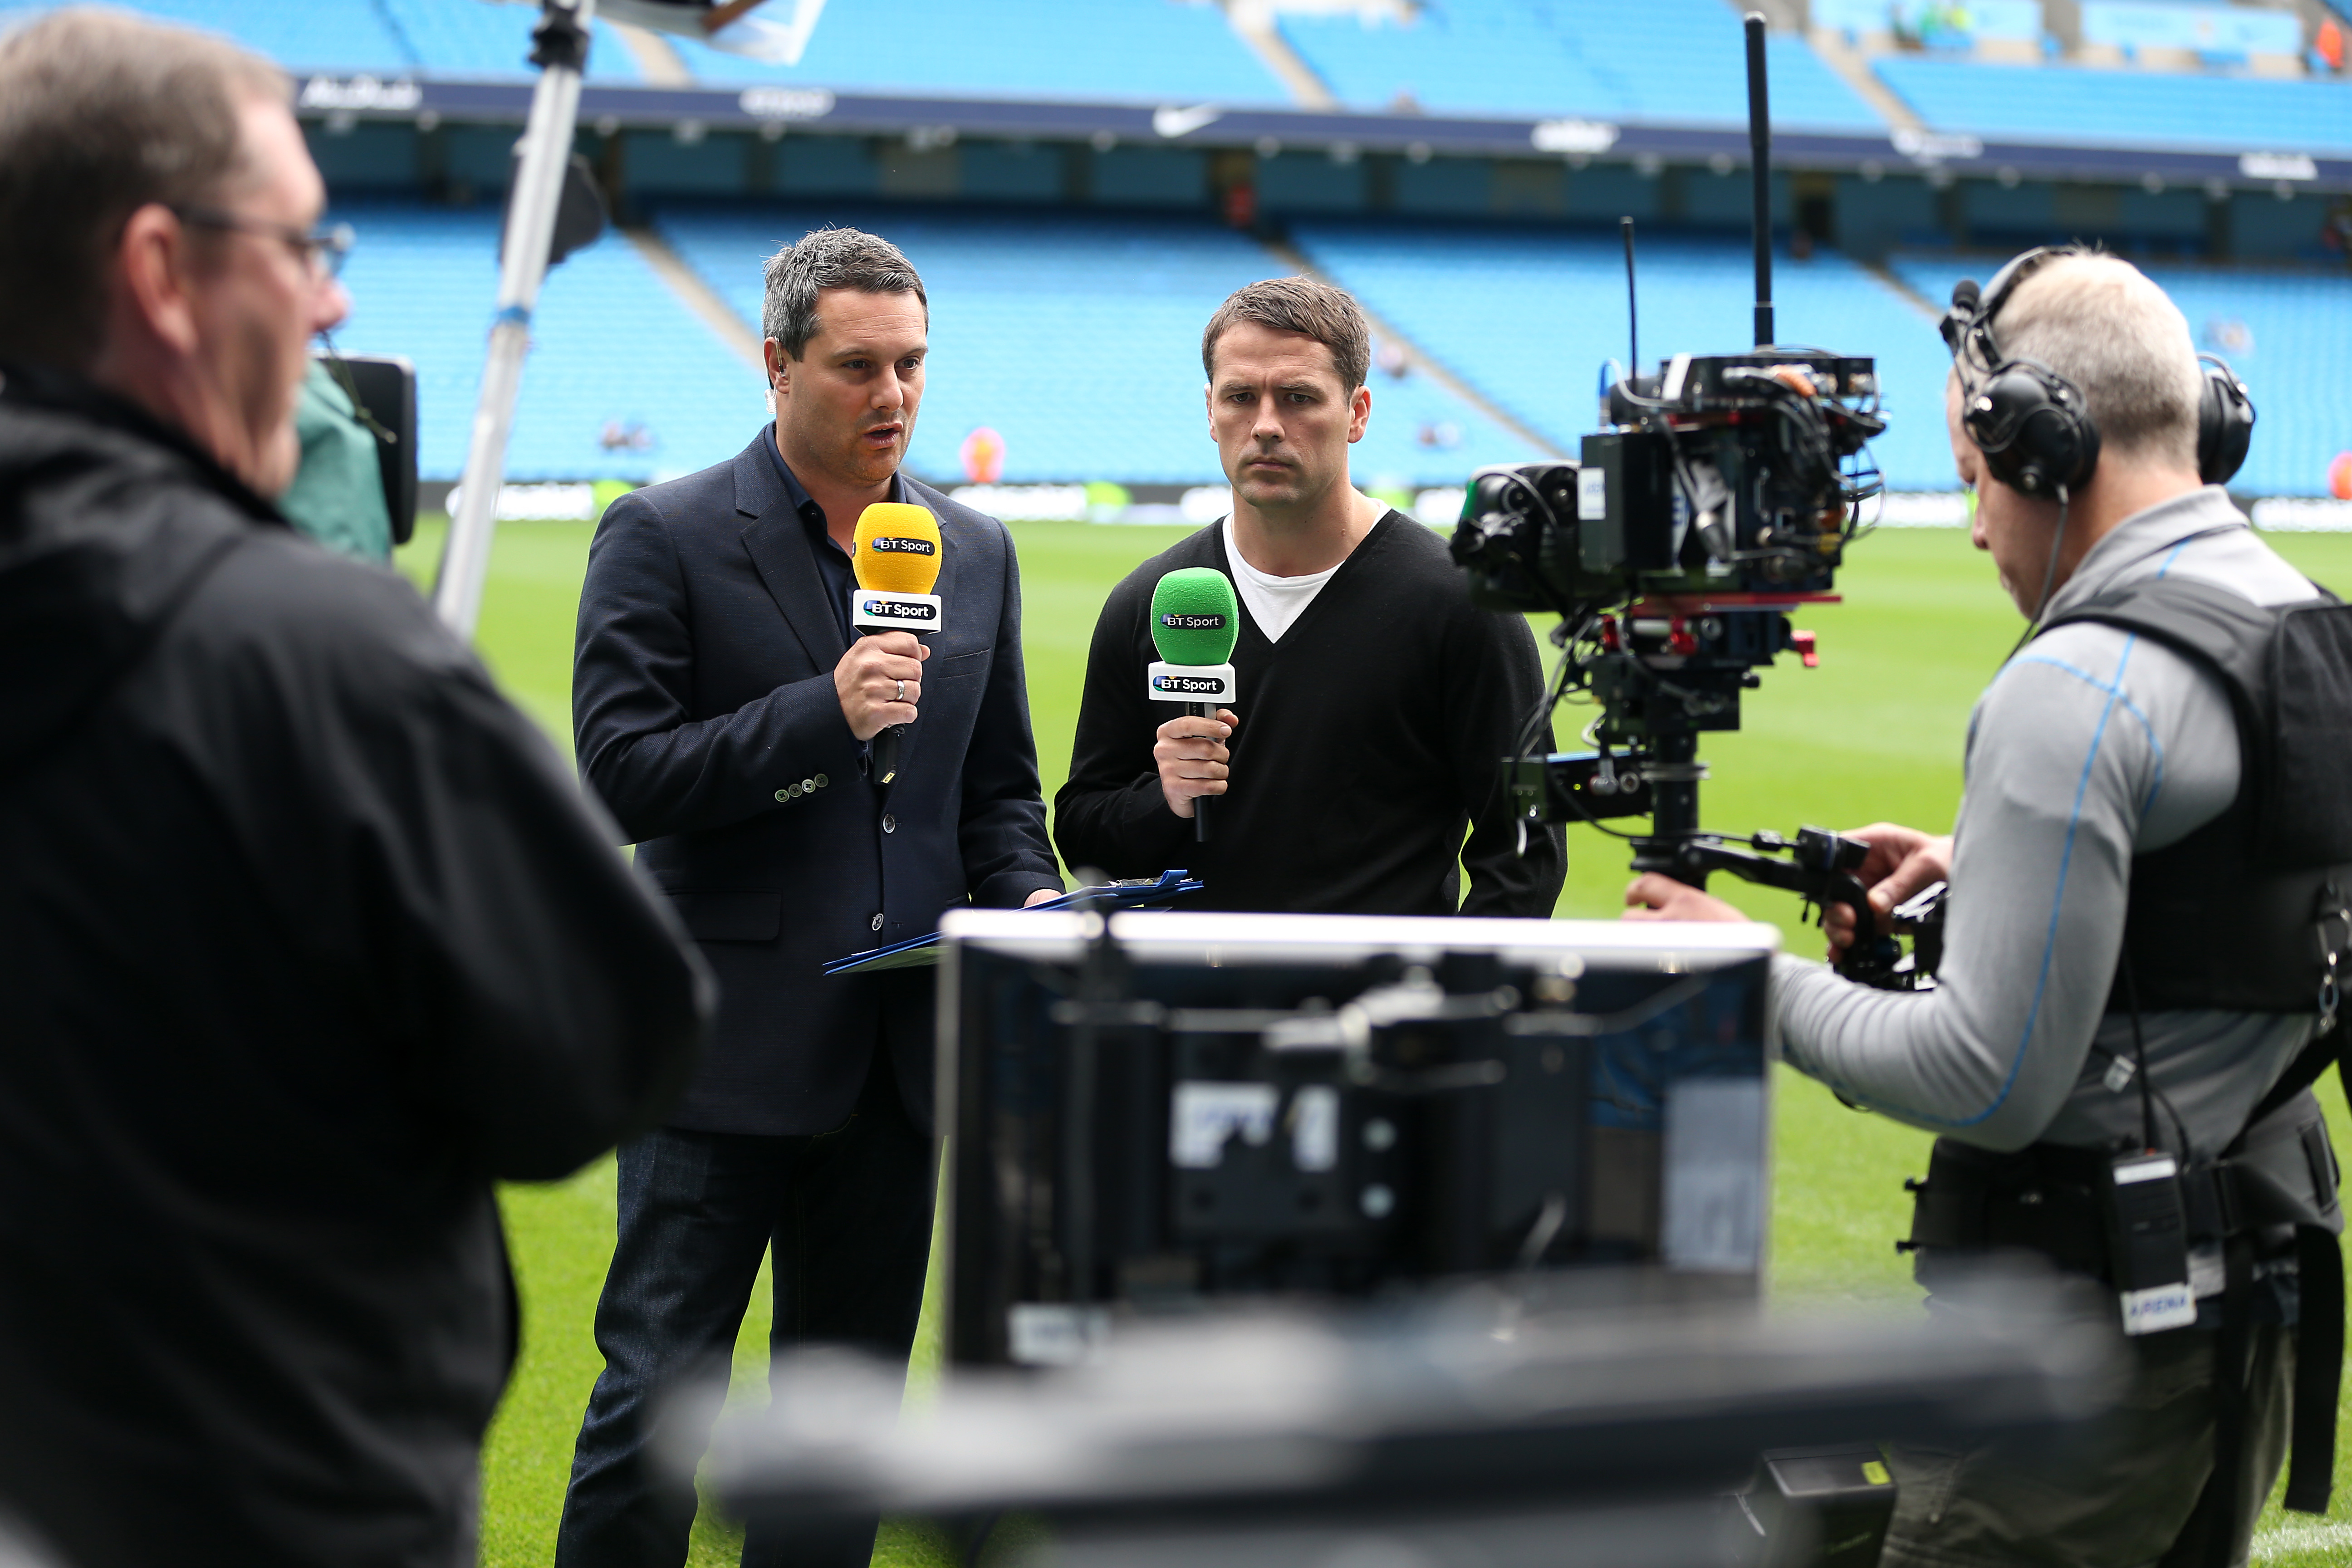 Soccer - Barclays Premier League - Manchester City v Everton - Etihad Stadium